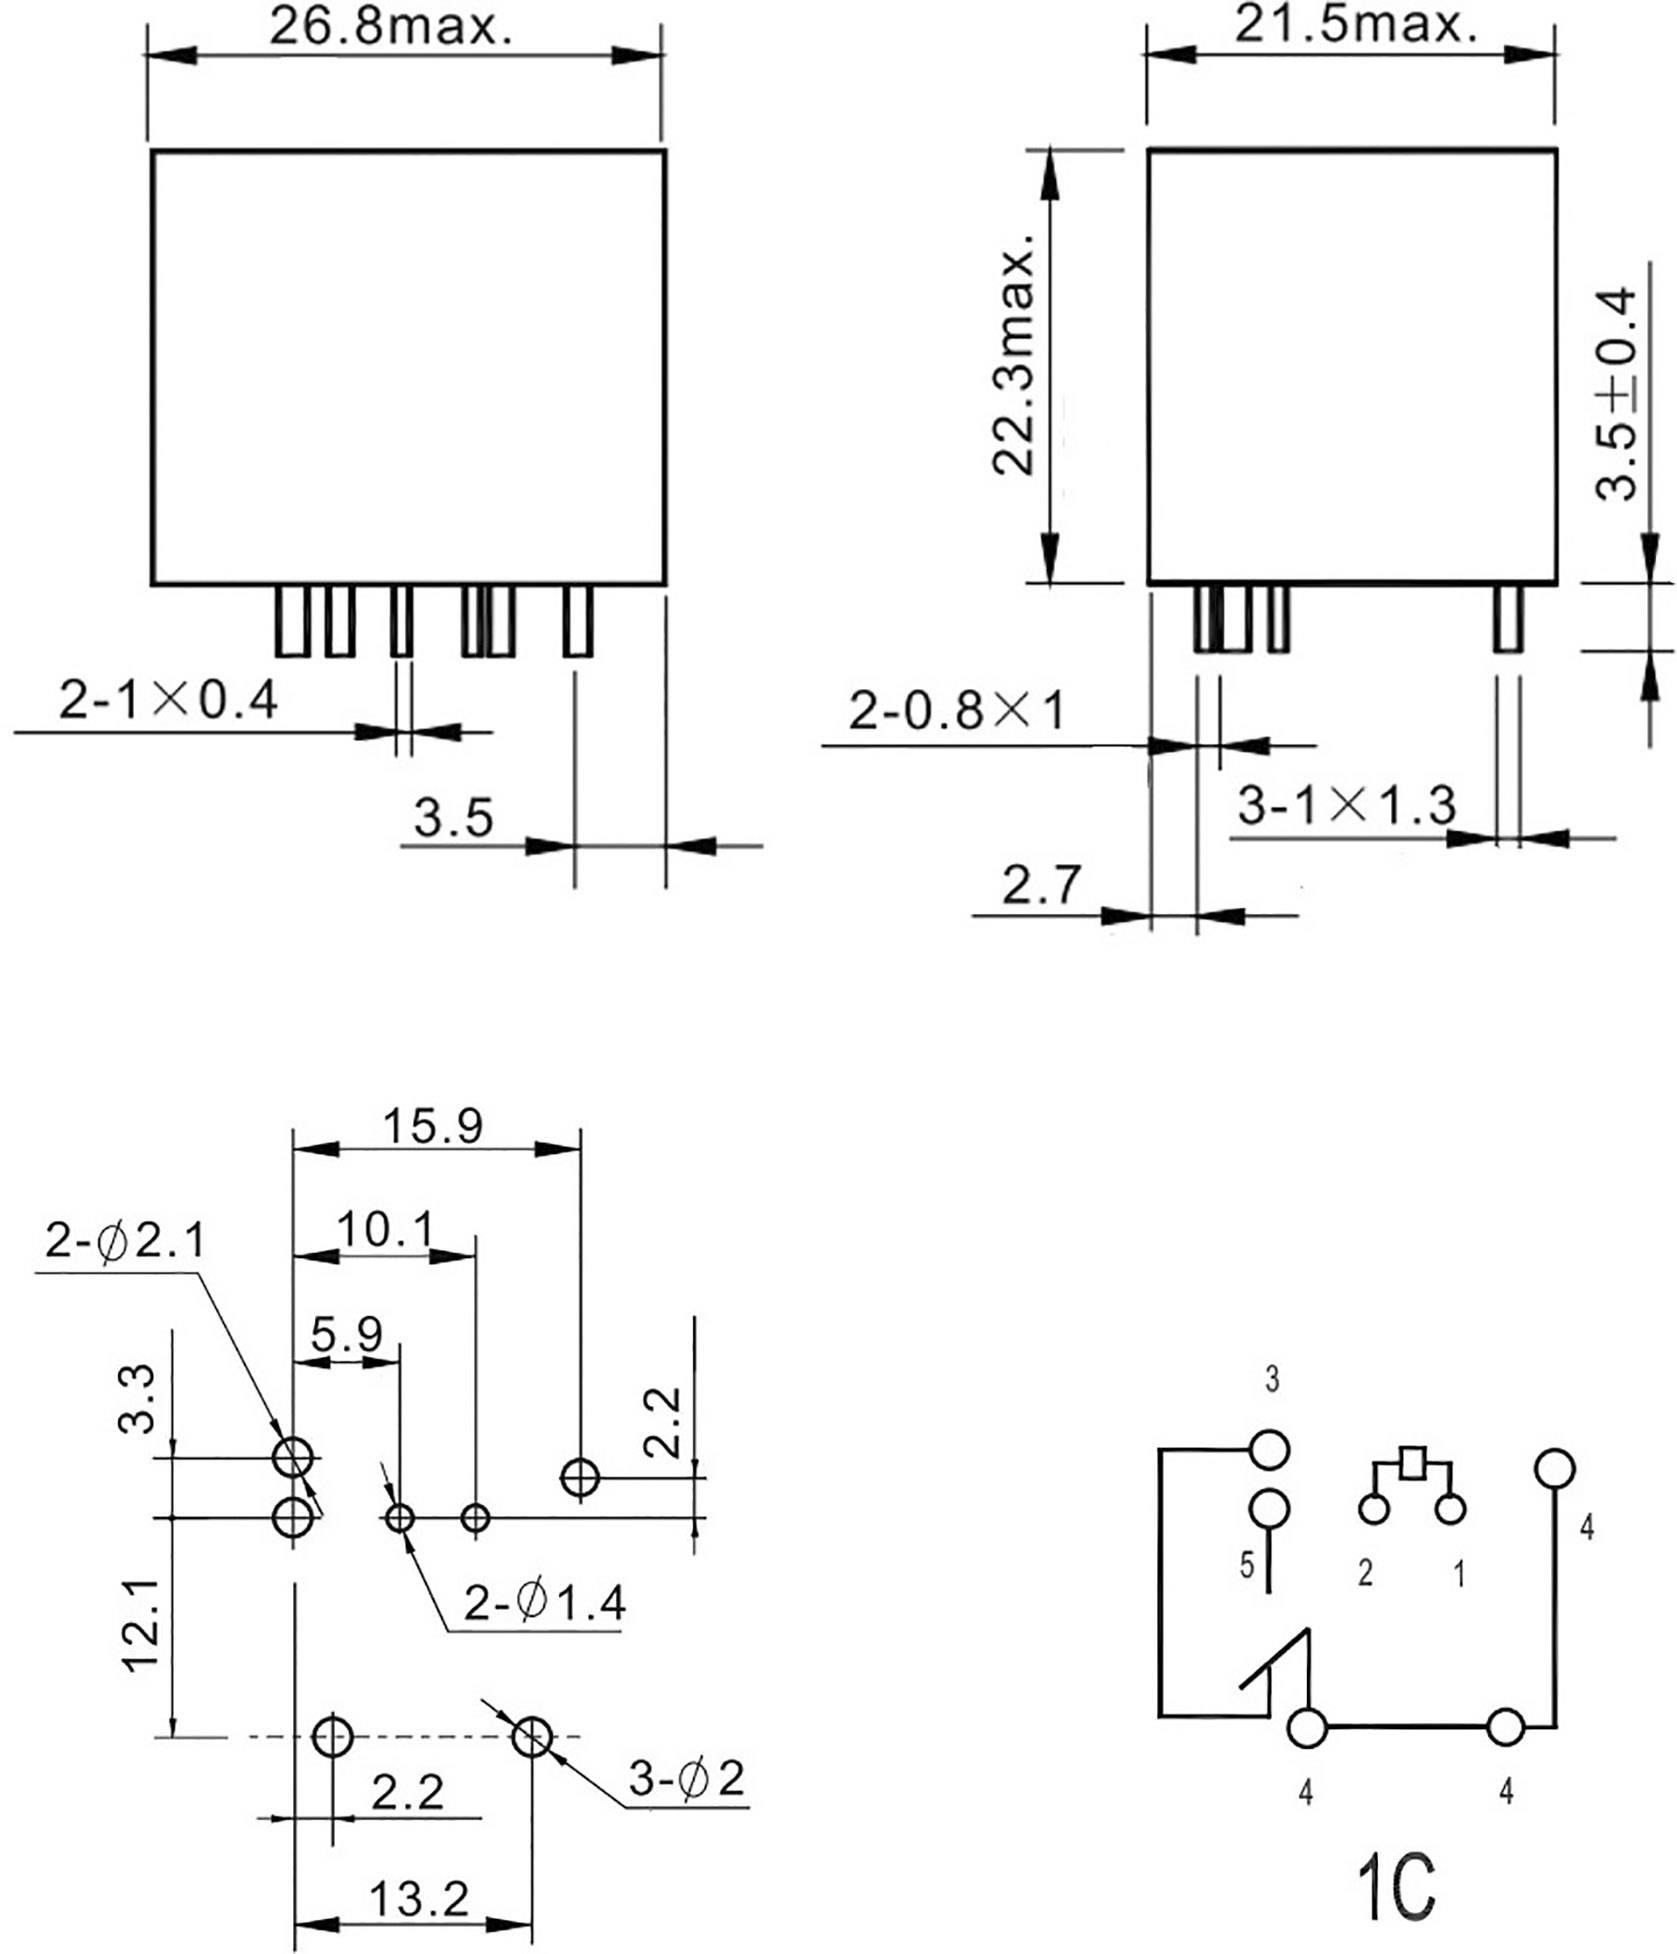 FiC Relais Automobile FRA2C-2-DC12V FRA2C-2-DC12V 12 V//DC 40 A 1 inverseur RT 1 pc s